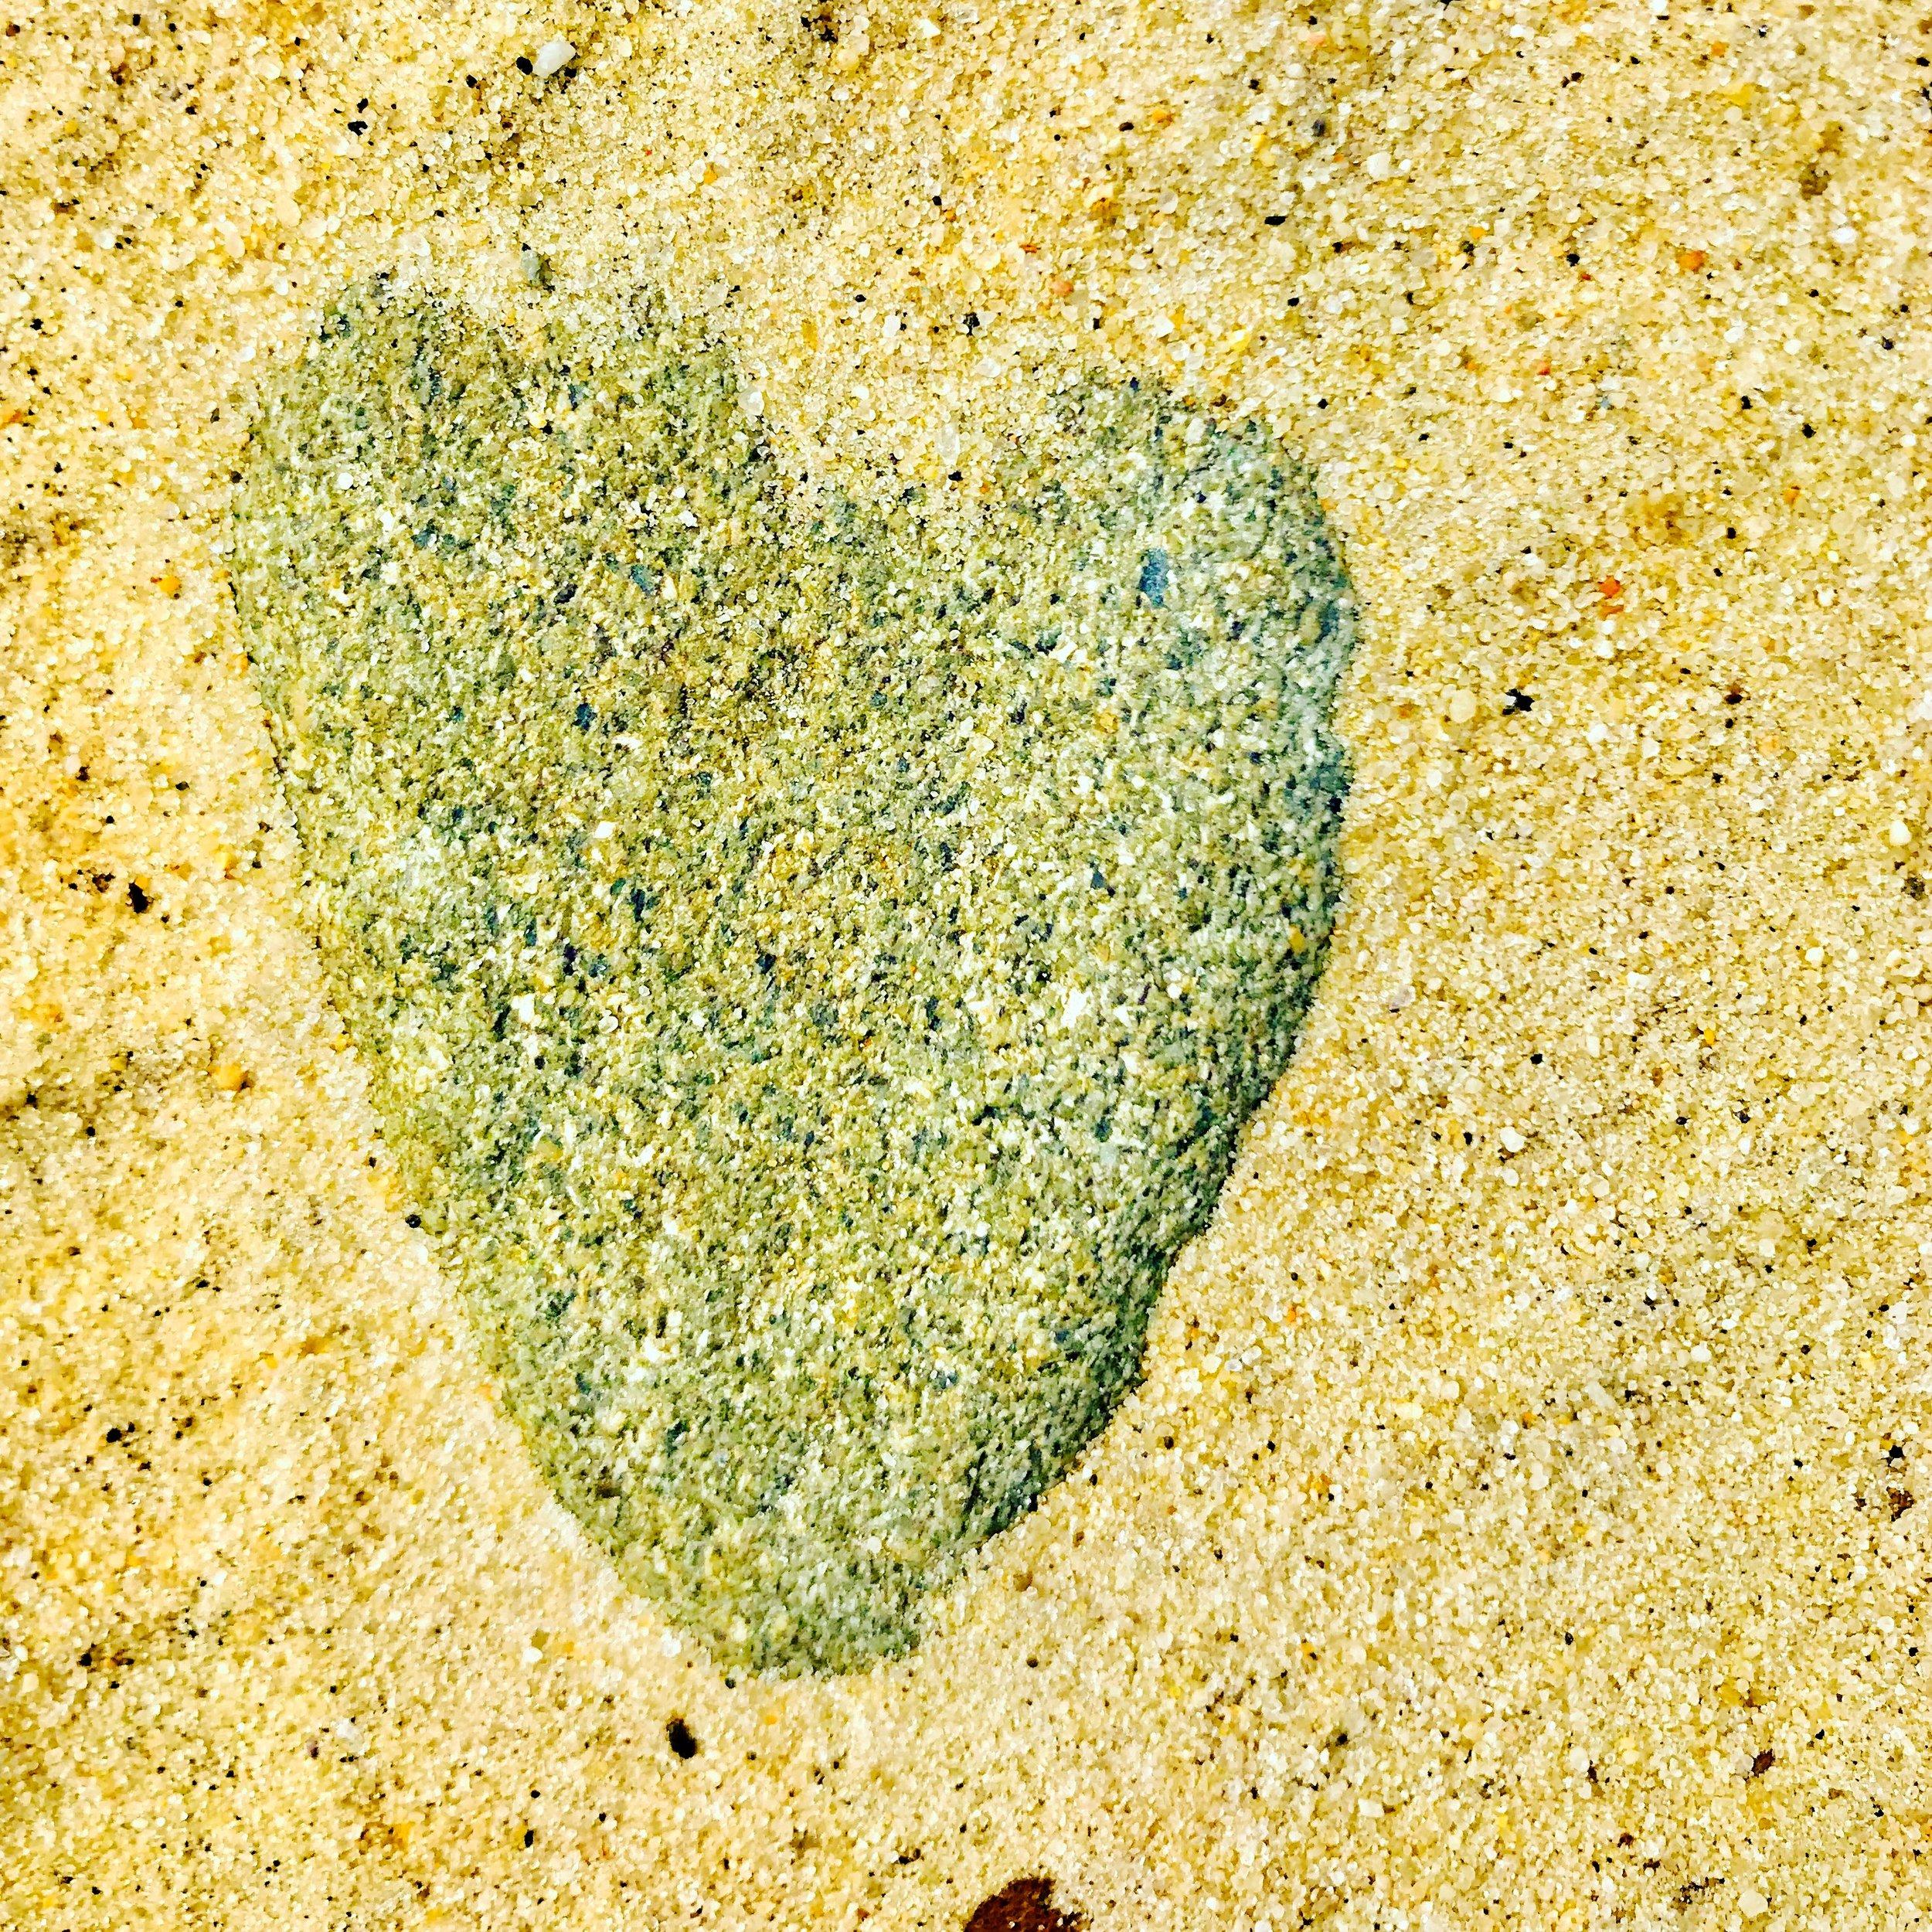 heartstone in sand.JPG